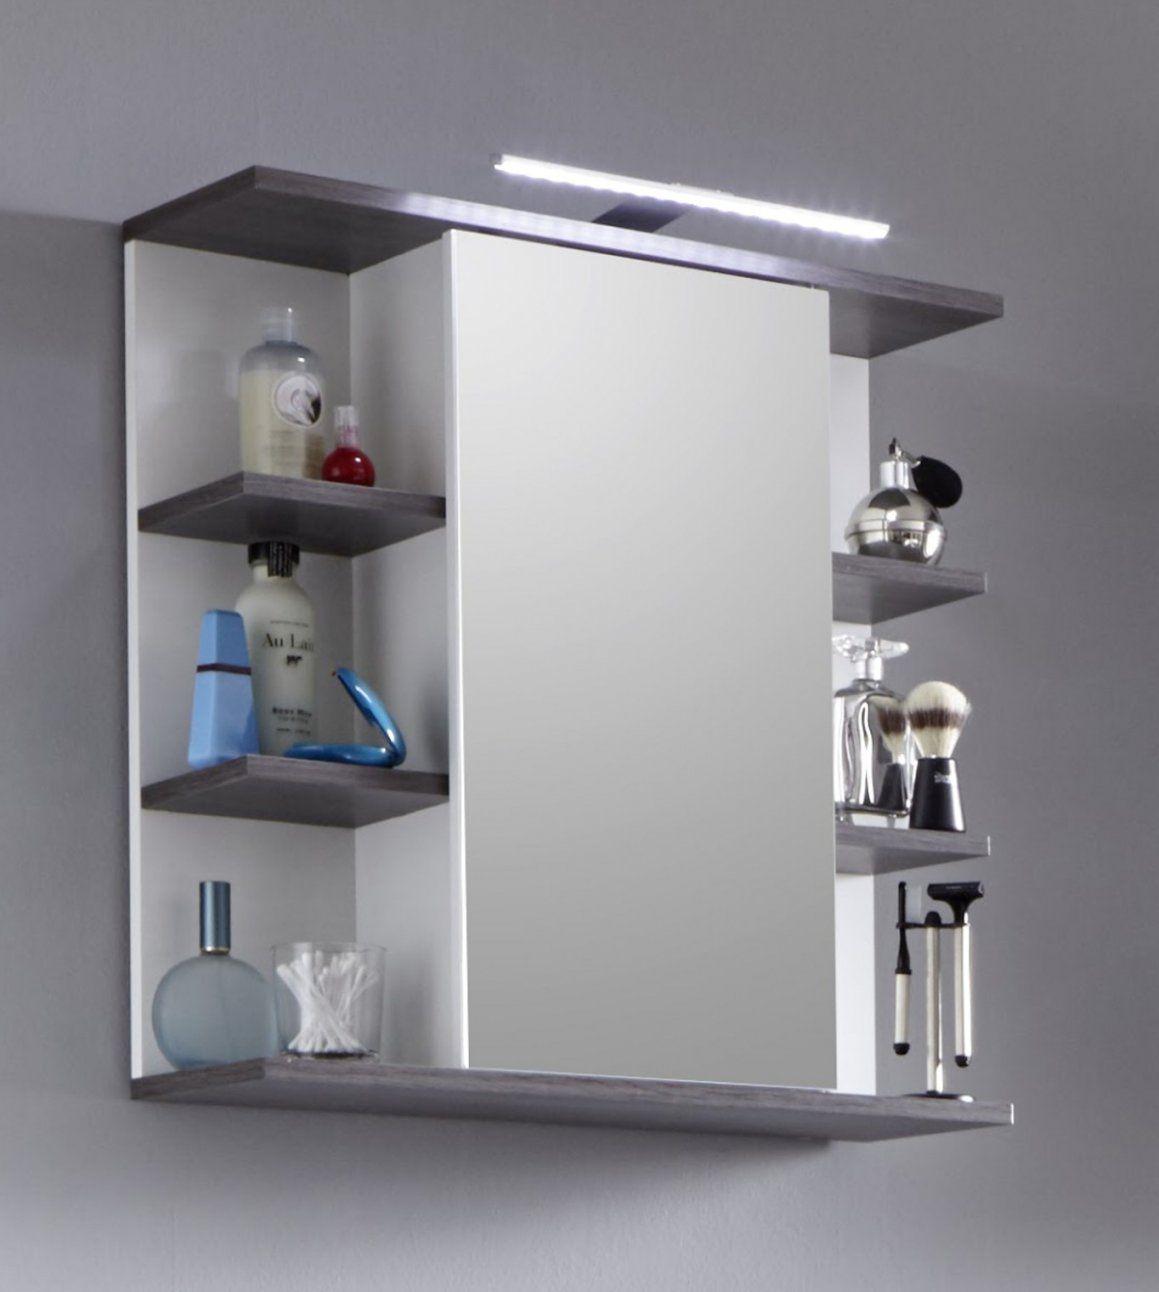 Genial Badezimmer Spiegelschrank California Für Spiegelschrank 60 Cm von Spiegelschrank Bad 60 Cm Photo